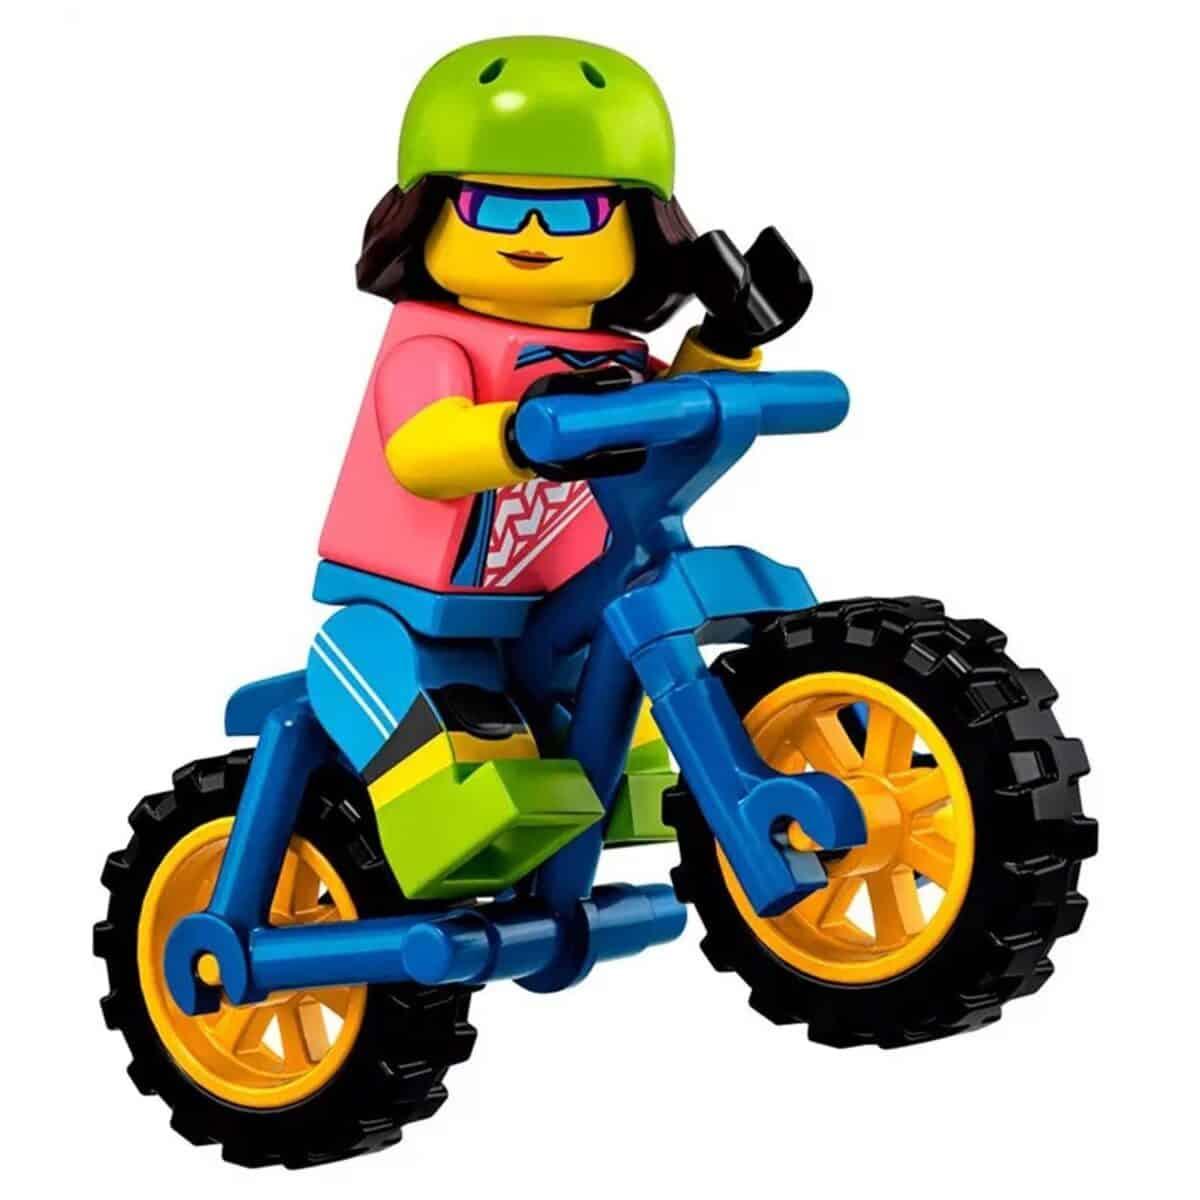 LEGO Biker Girl Minifigure with BMX Bike – Series 19 CMF